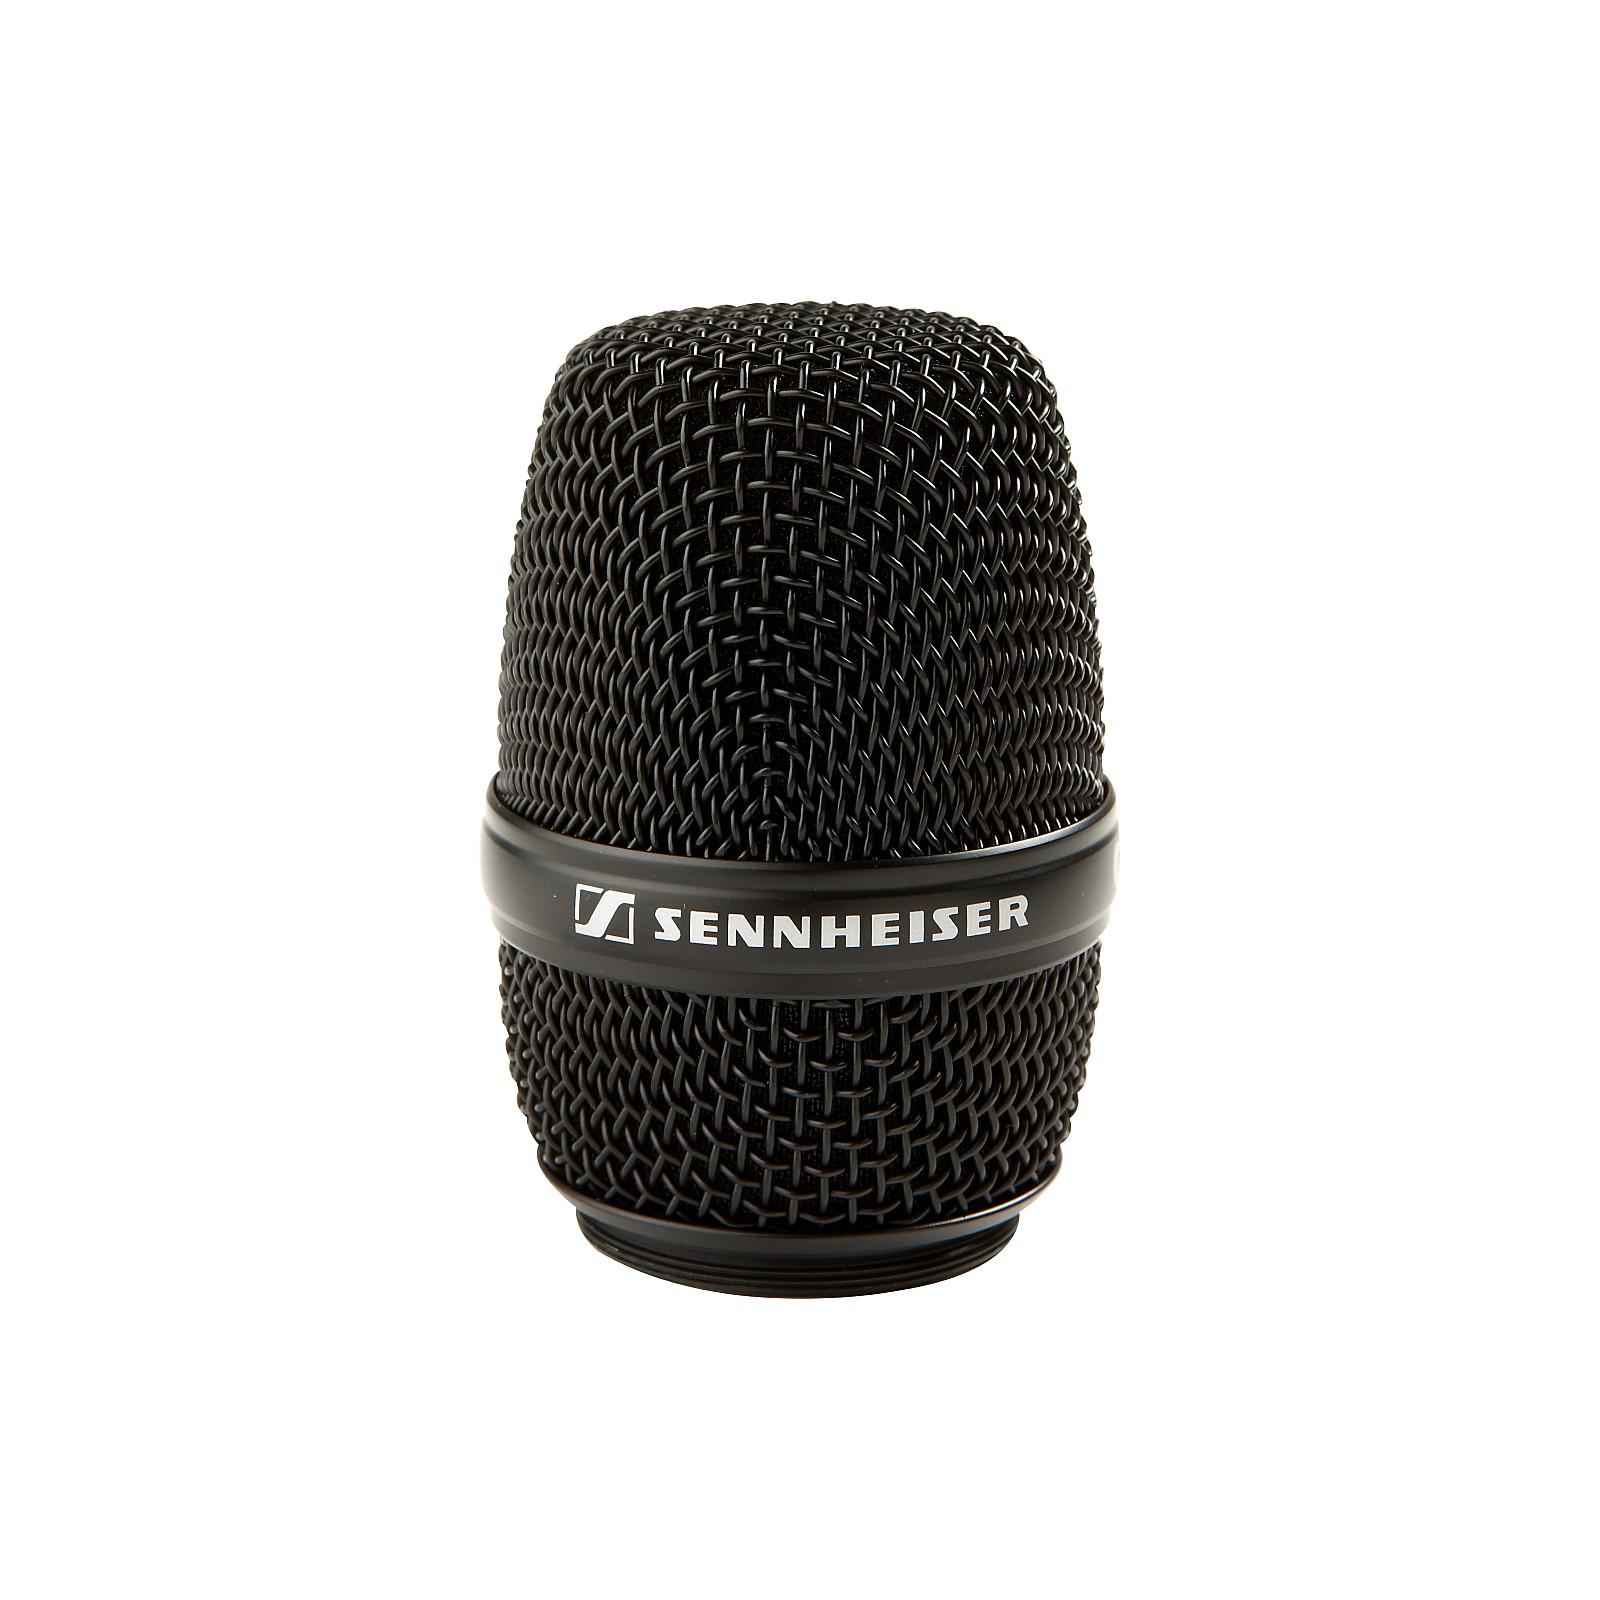 Sennheiser MMD 935-1 e935 Wireless Mic Capsule